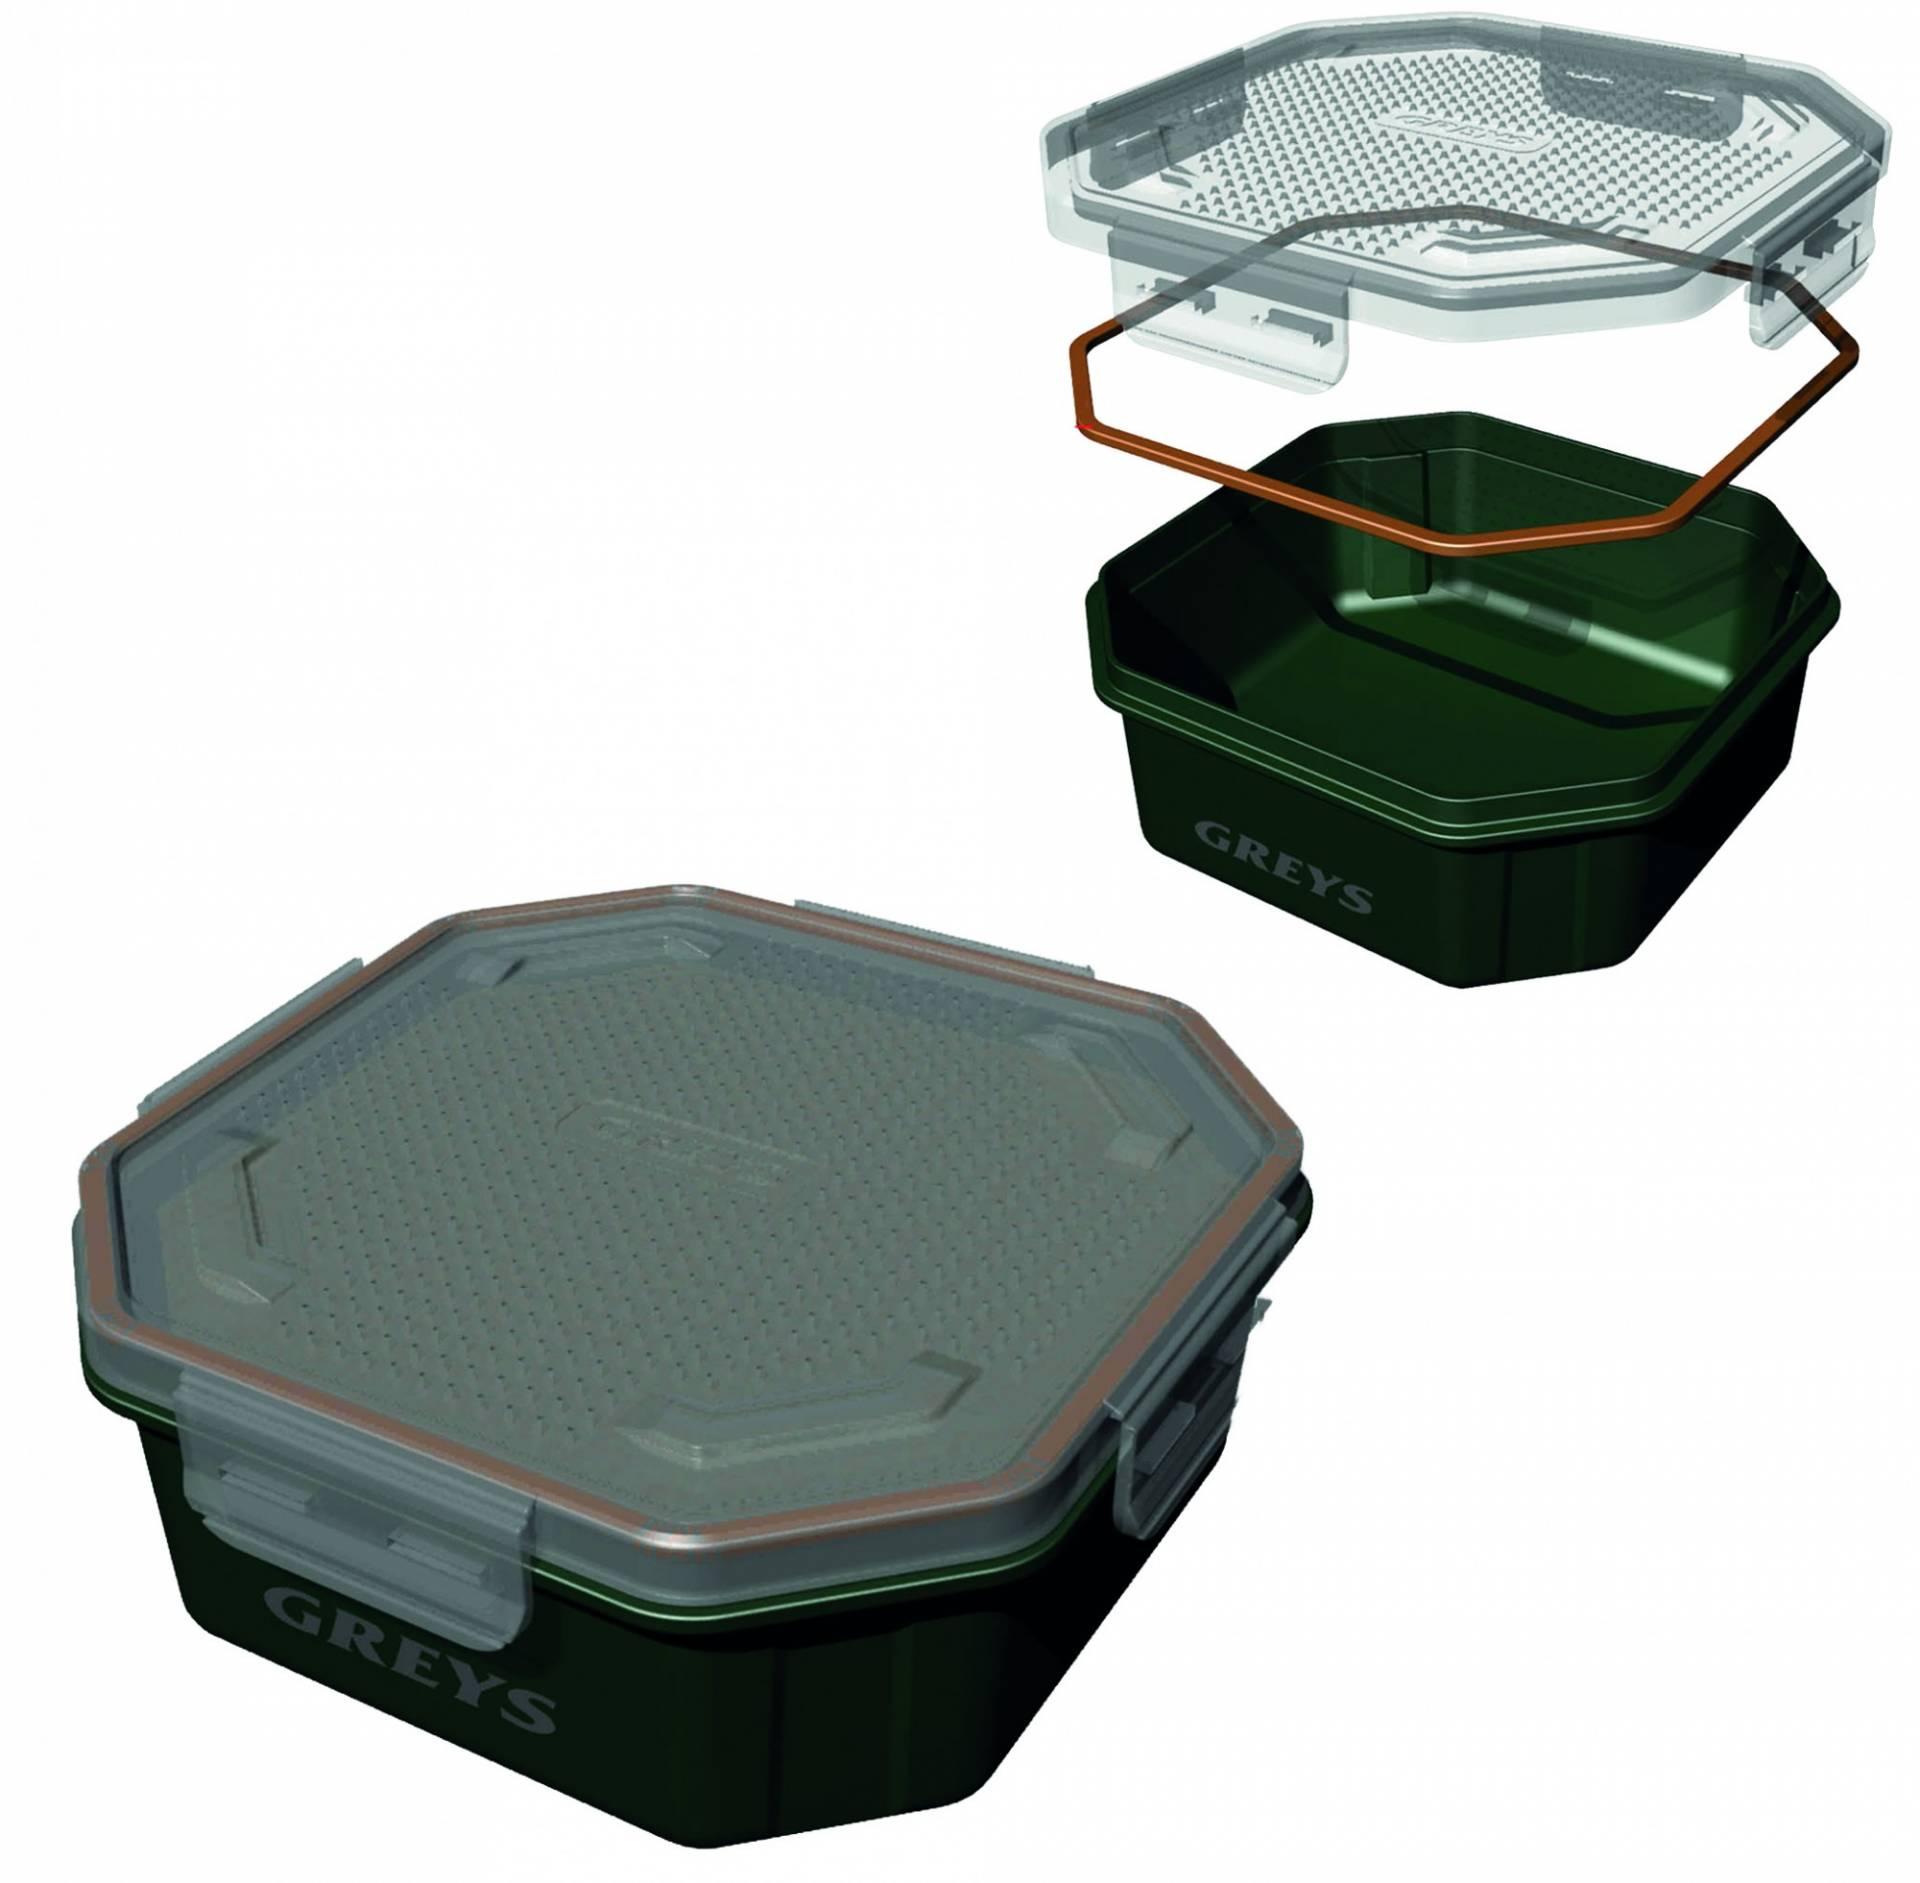 1 96l Wurmdose Wurmbox Köderbox Baitbox Madendose Madenbox Greys Prodigy Klip-Lok Flip Top Perforated Köderbox 3 4pt